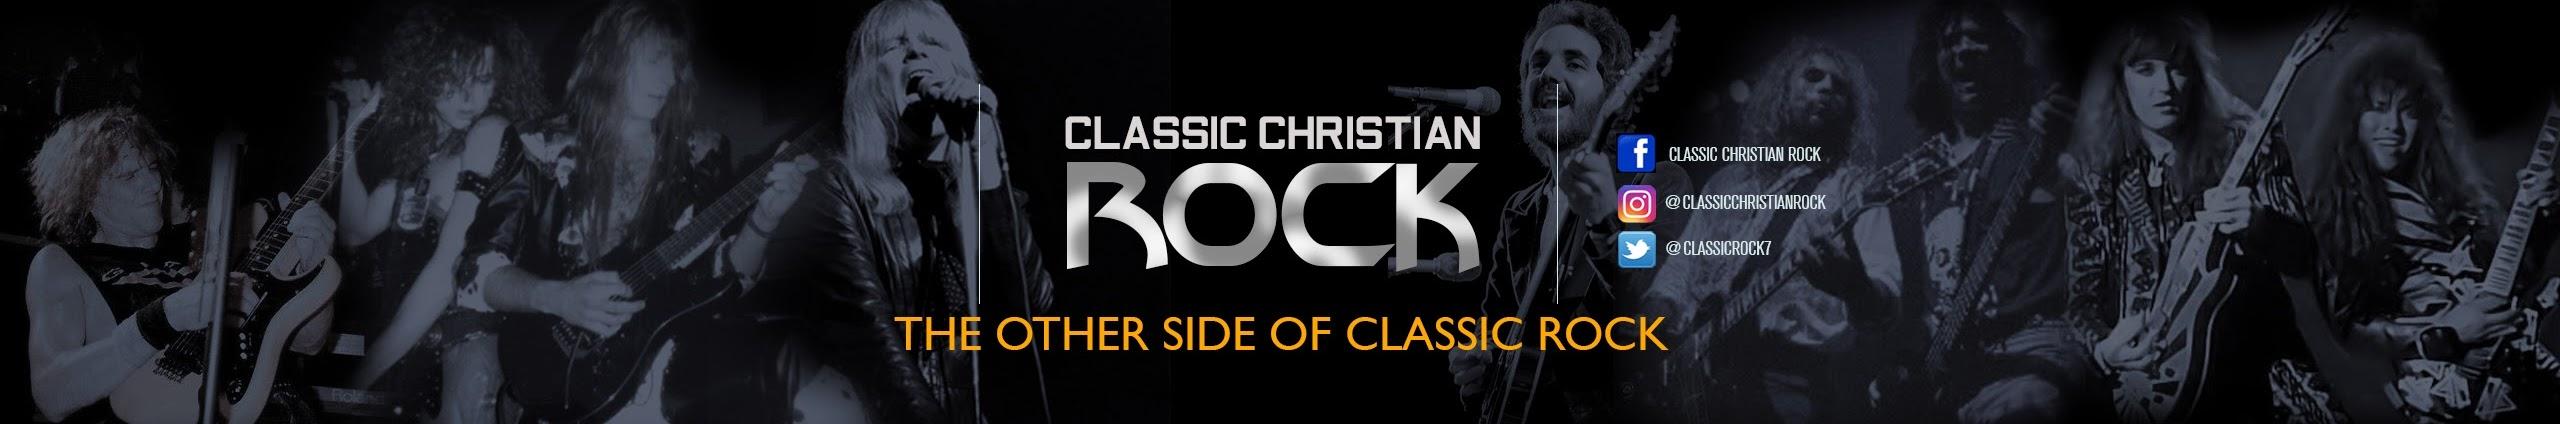 Classic Christian Rock - YouTube